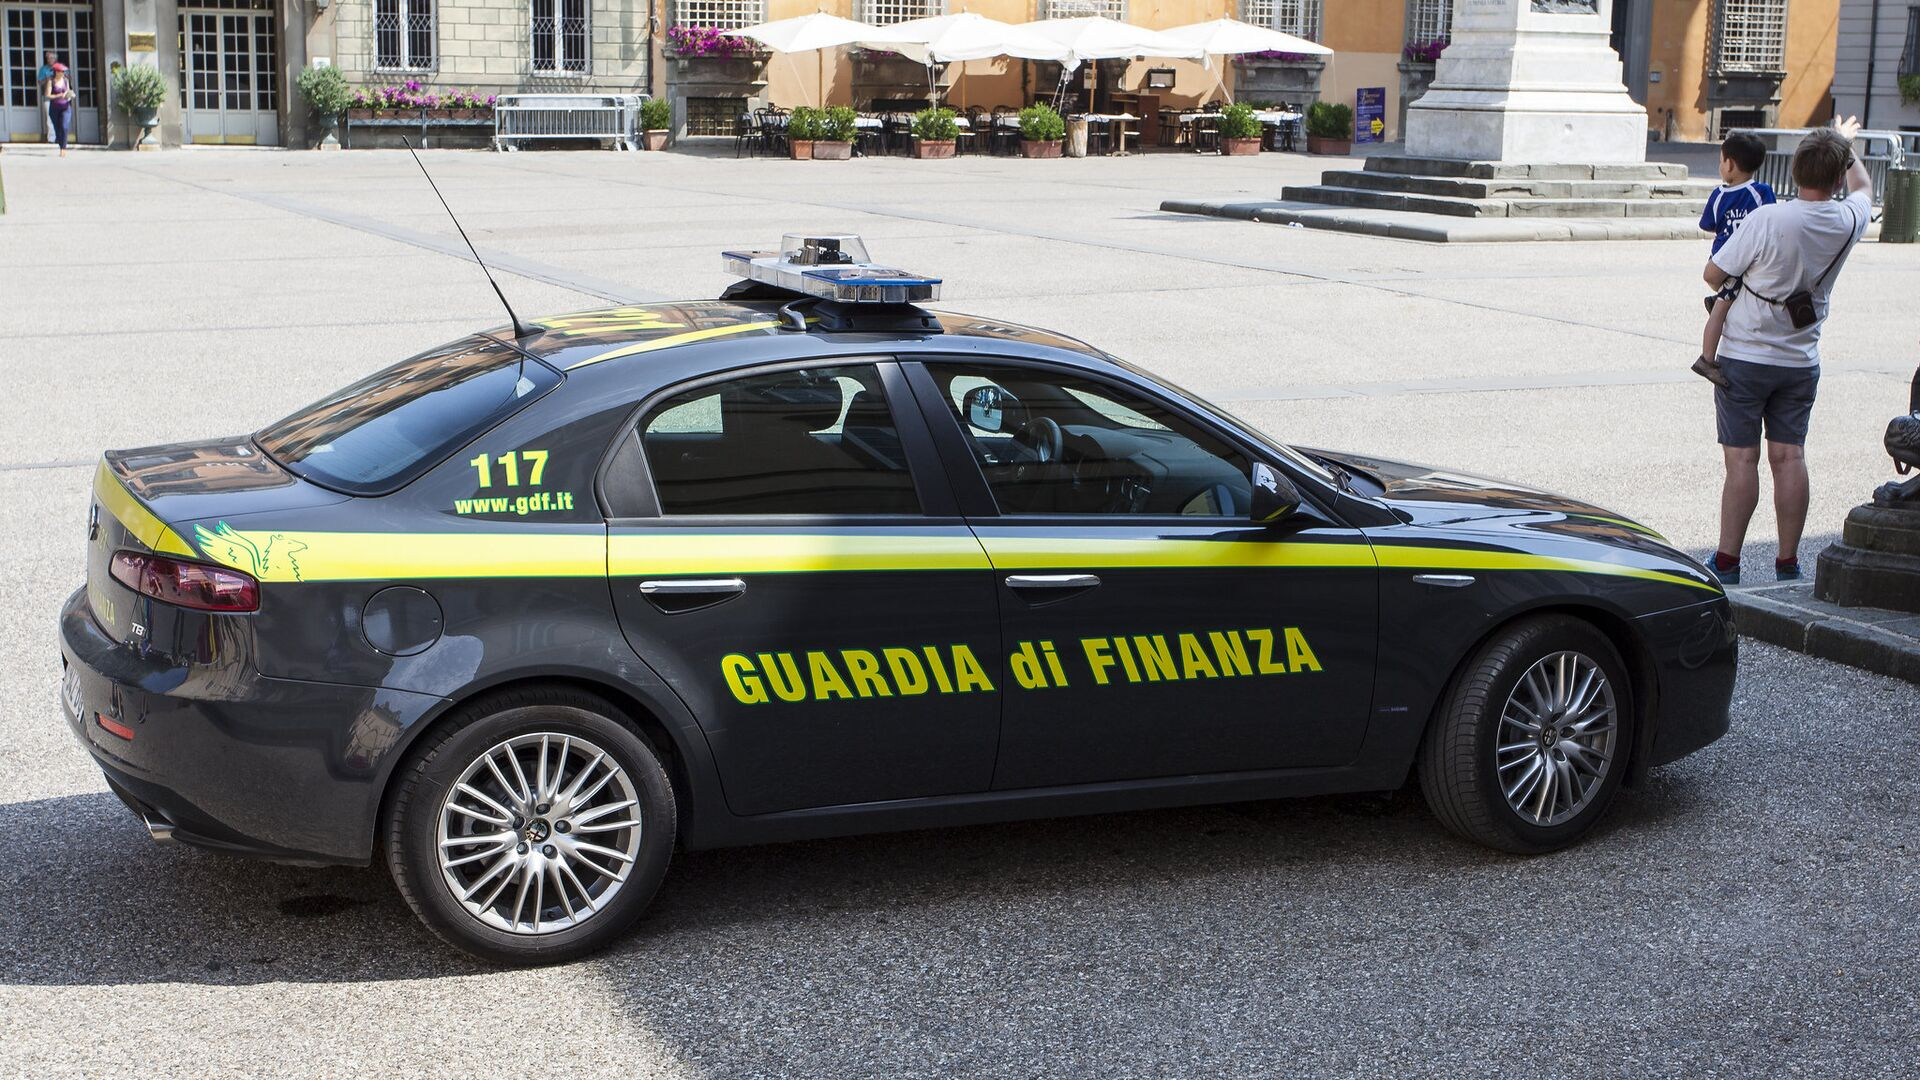 Guardia di Finanza - Sputnik Italia, 1920, 18.02.2021